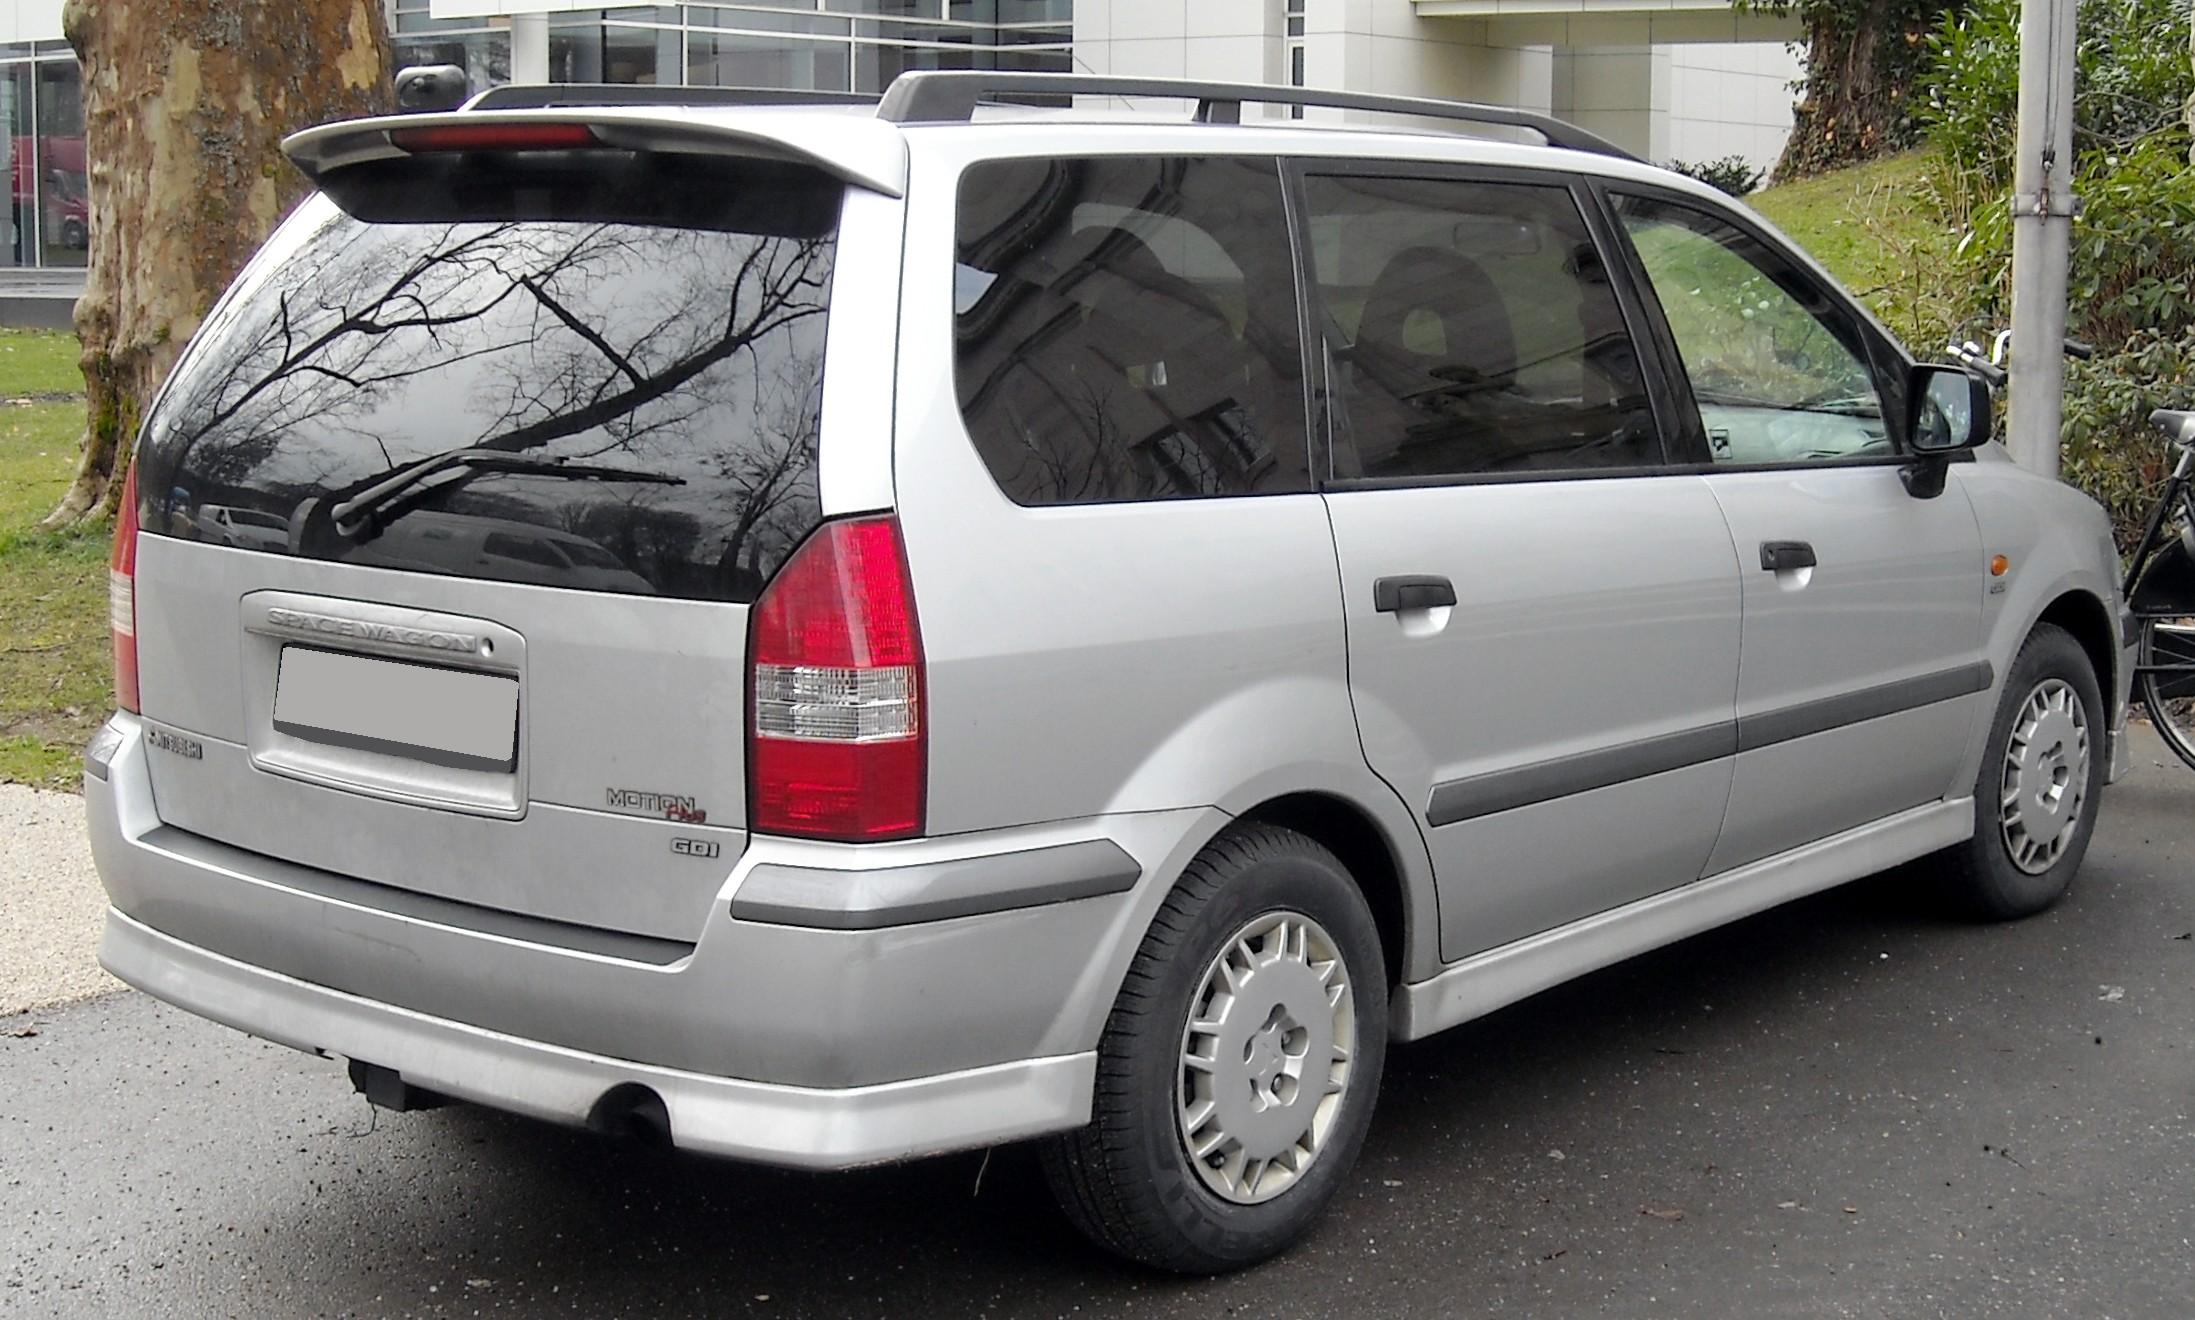 file mitsubishi space wagon rear wikipedia. Black Bedroom Furniture Sets. Home Design Ideas